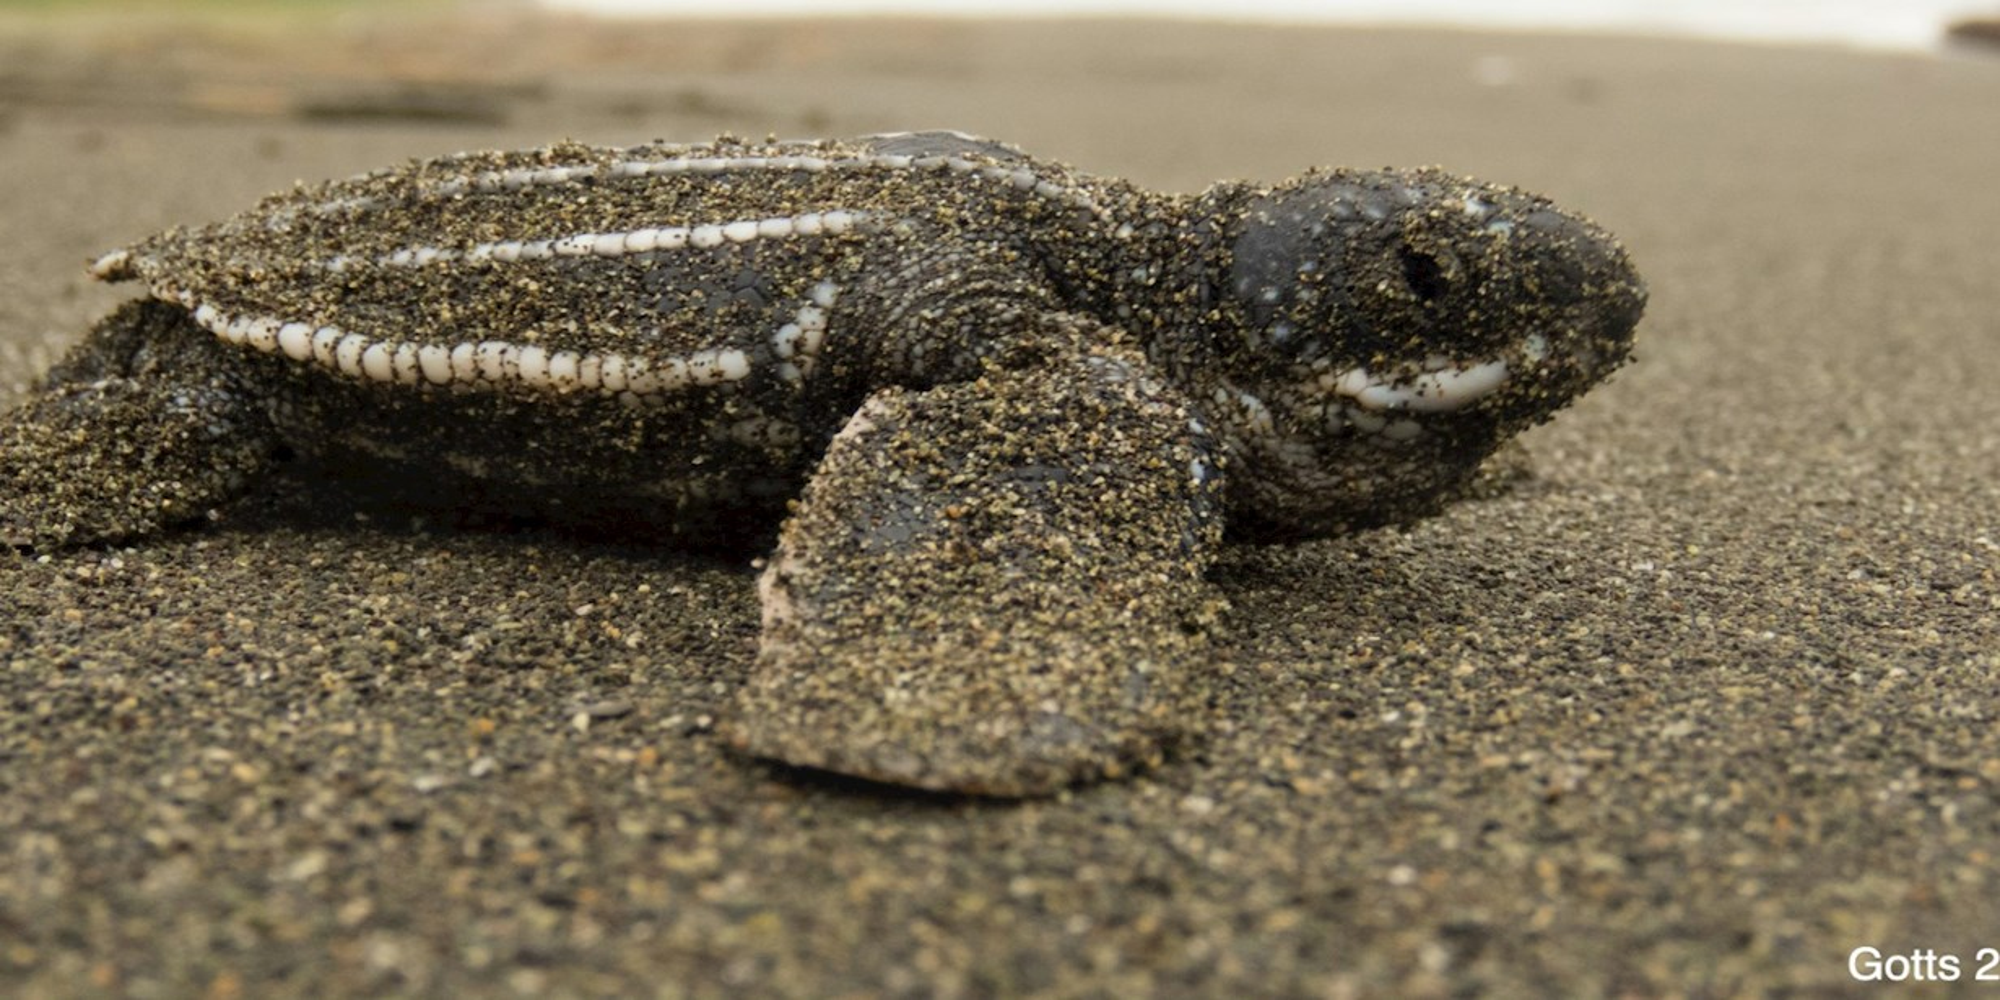 Pacific leatherback sea turtle